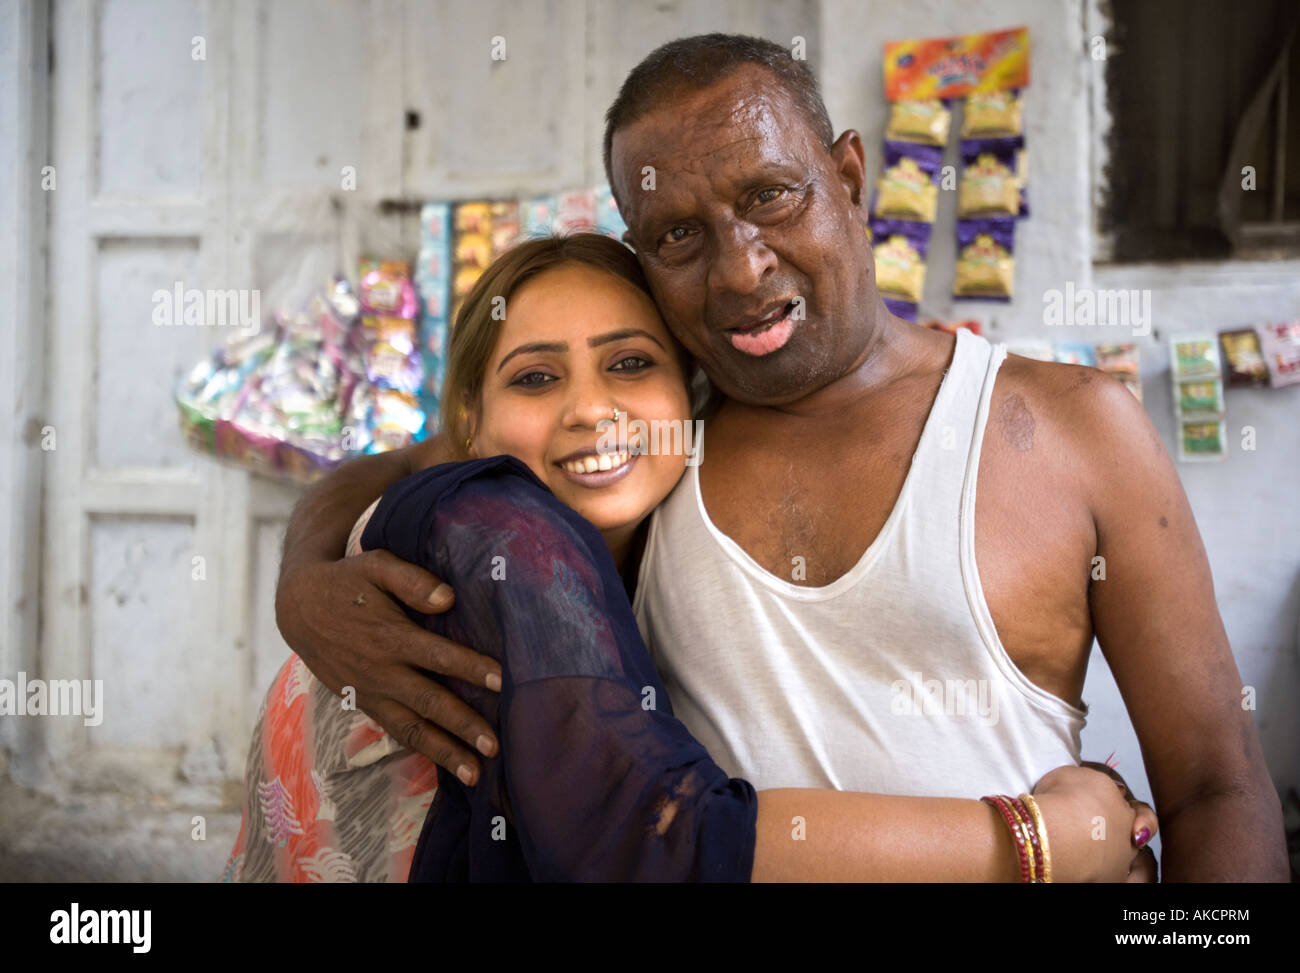 An Indian man with a facial difigurement - Stock Image